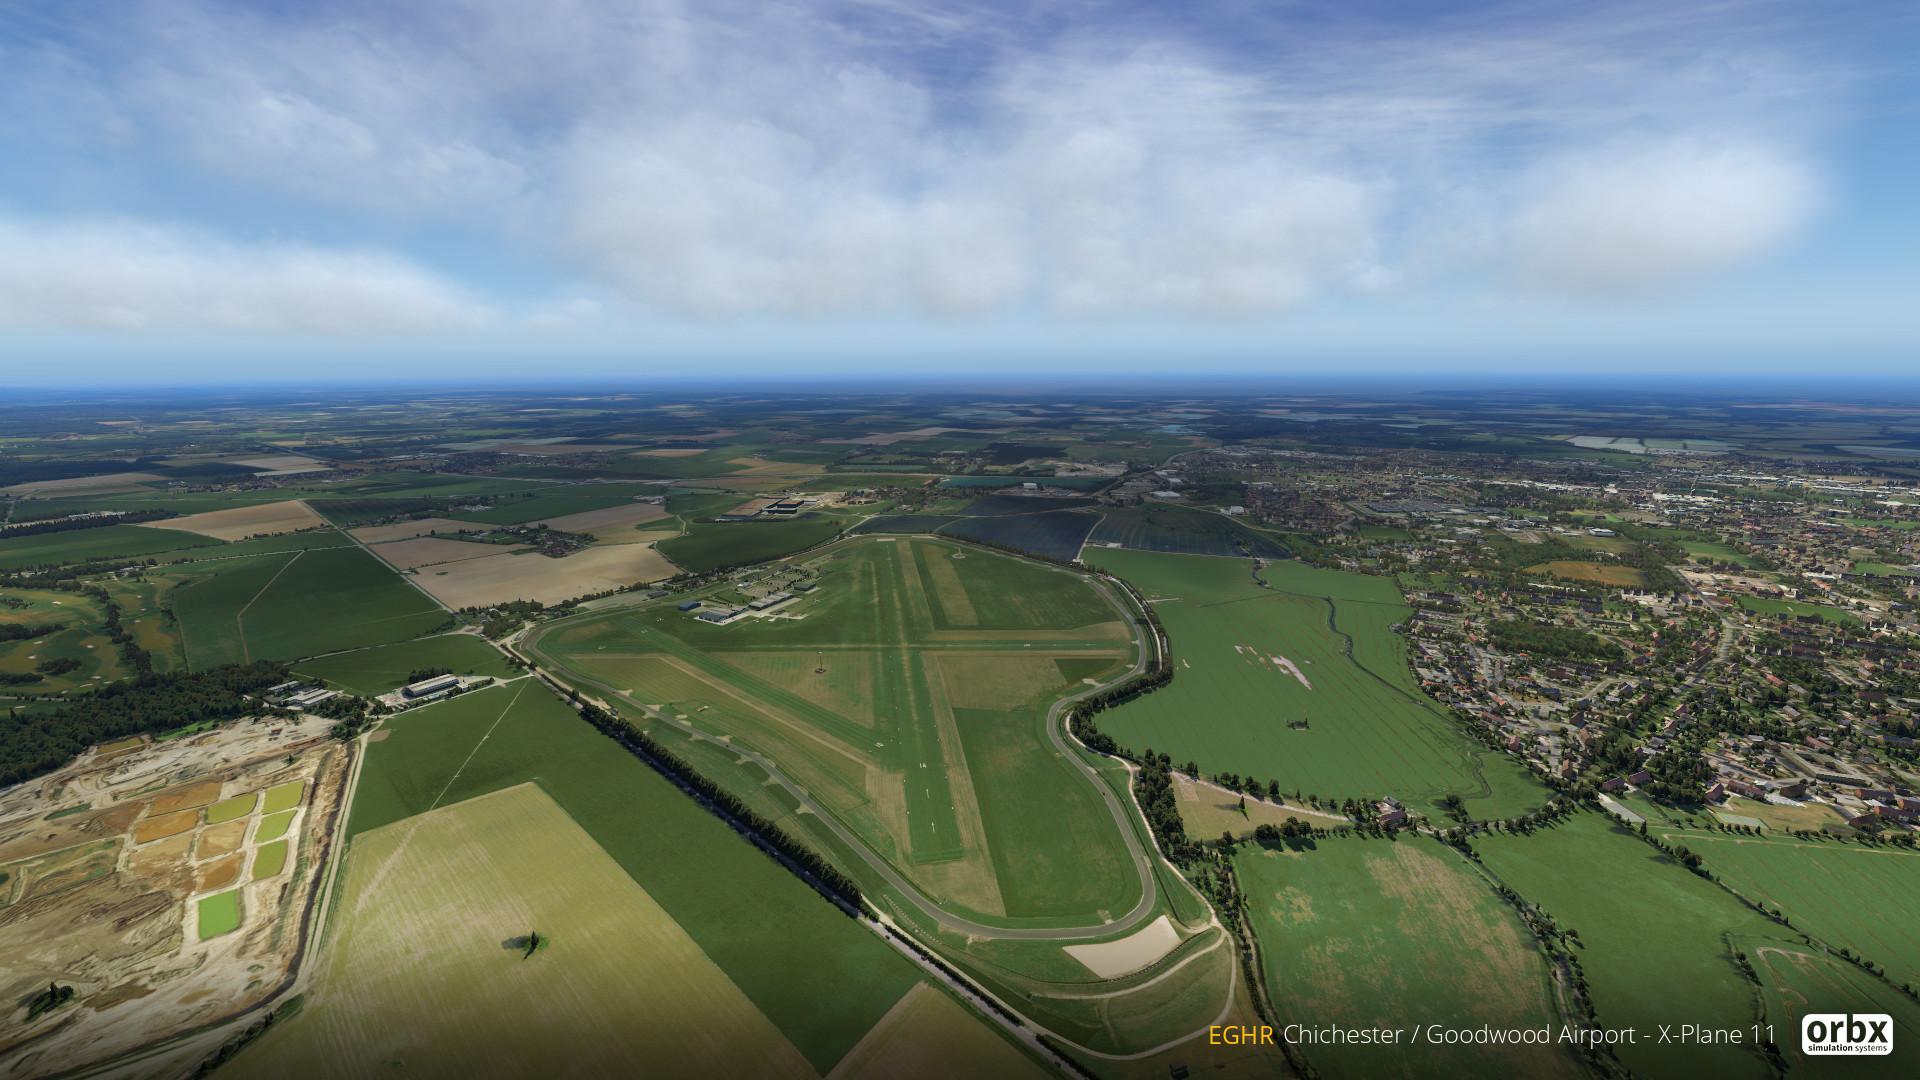 Orbx's Next UK Airport: Goodwood (EGHR) | Threshold